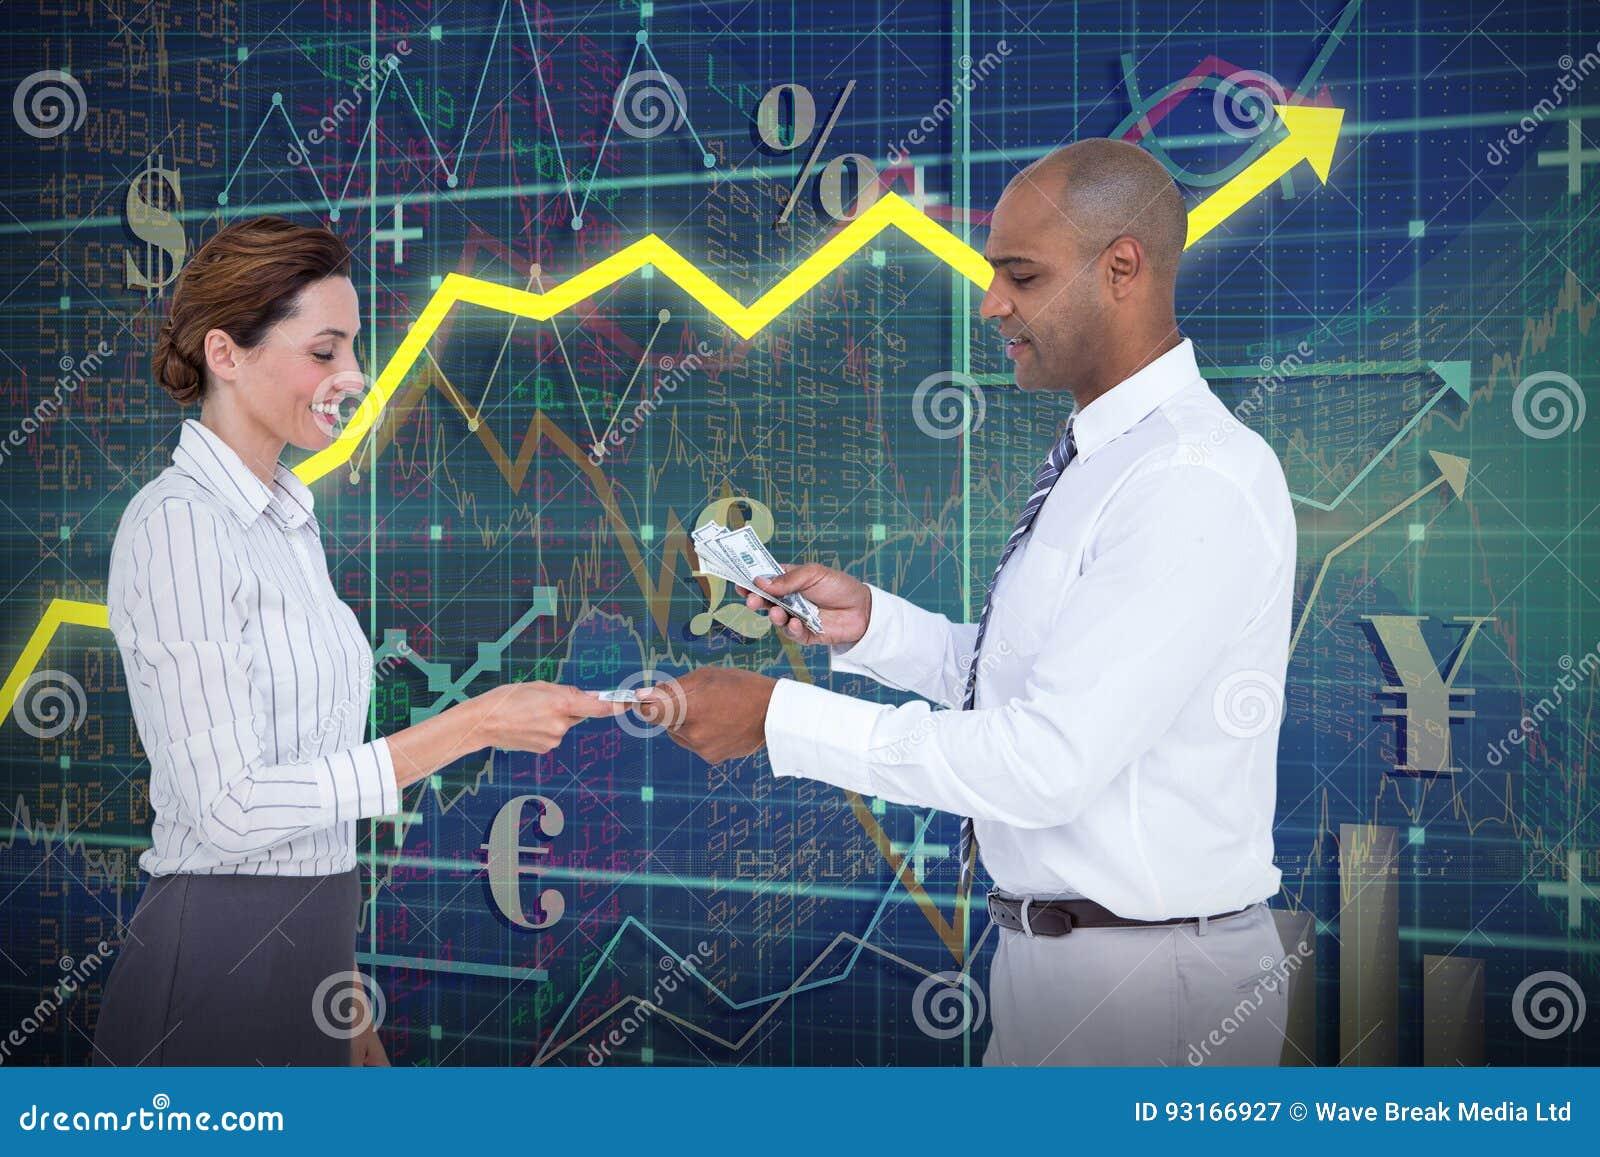 Composite image of businessman handing over money to businesswoman